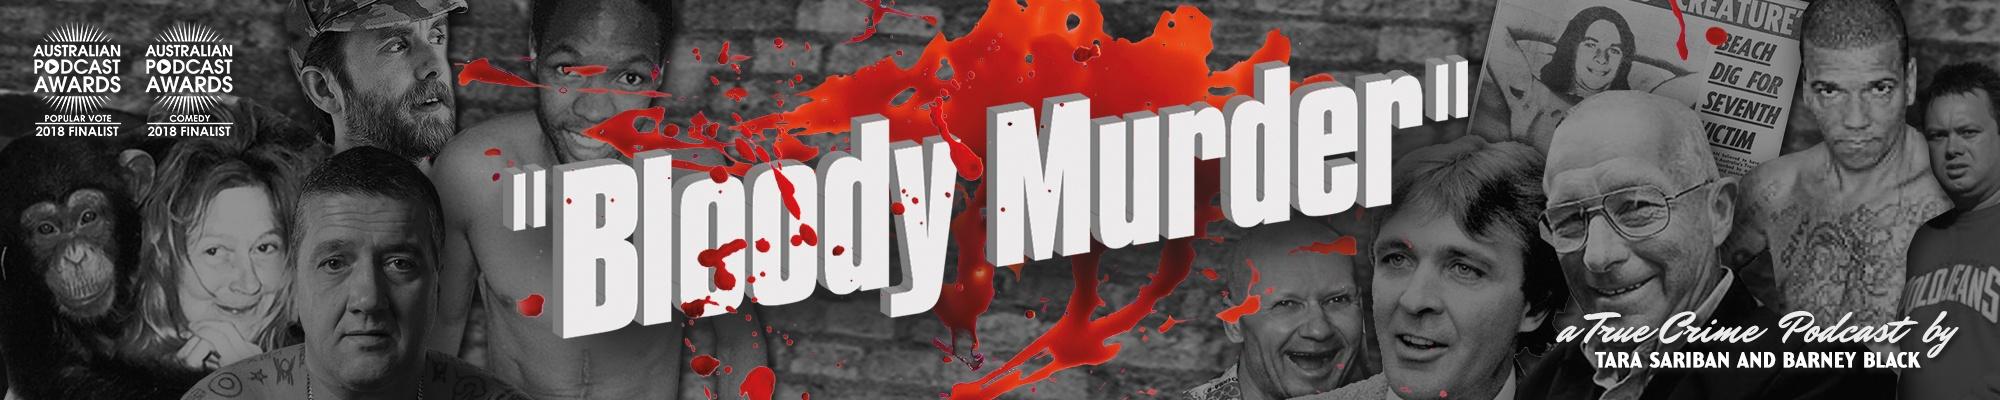 bloodymurder Cover